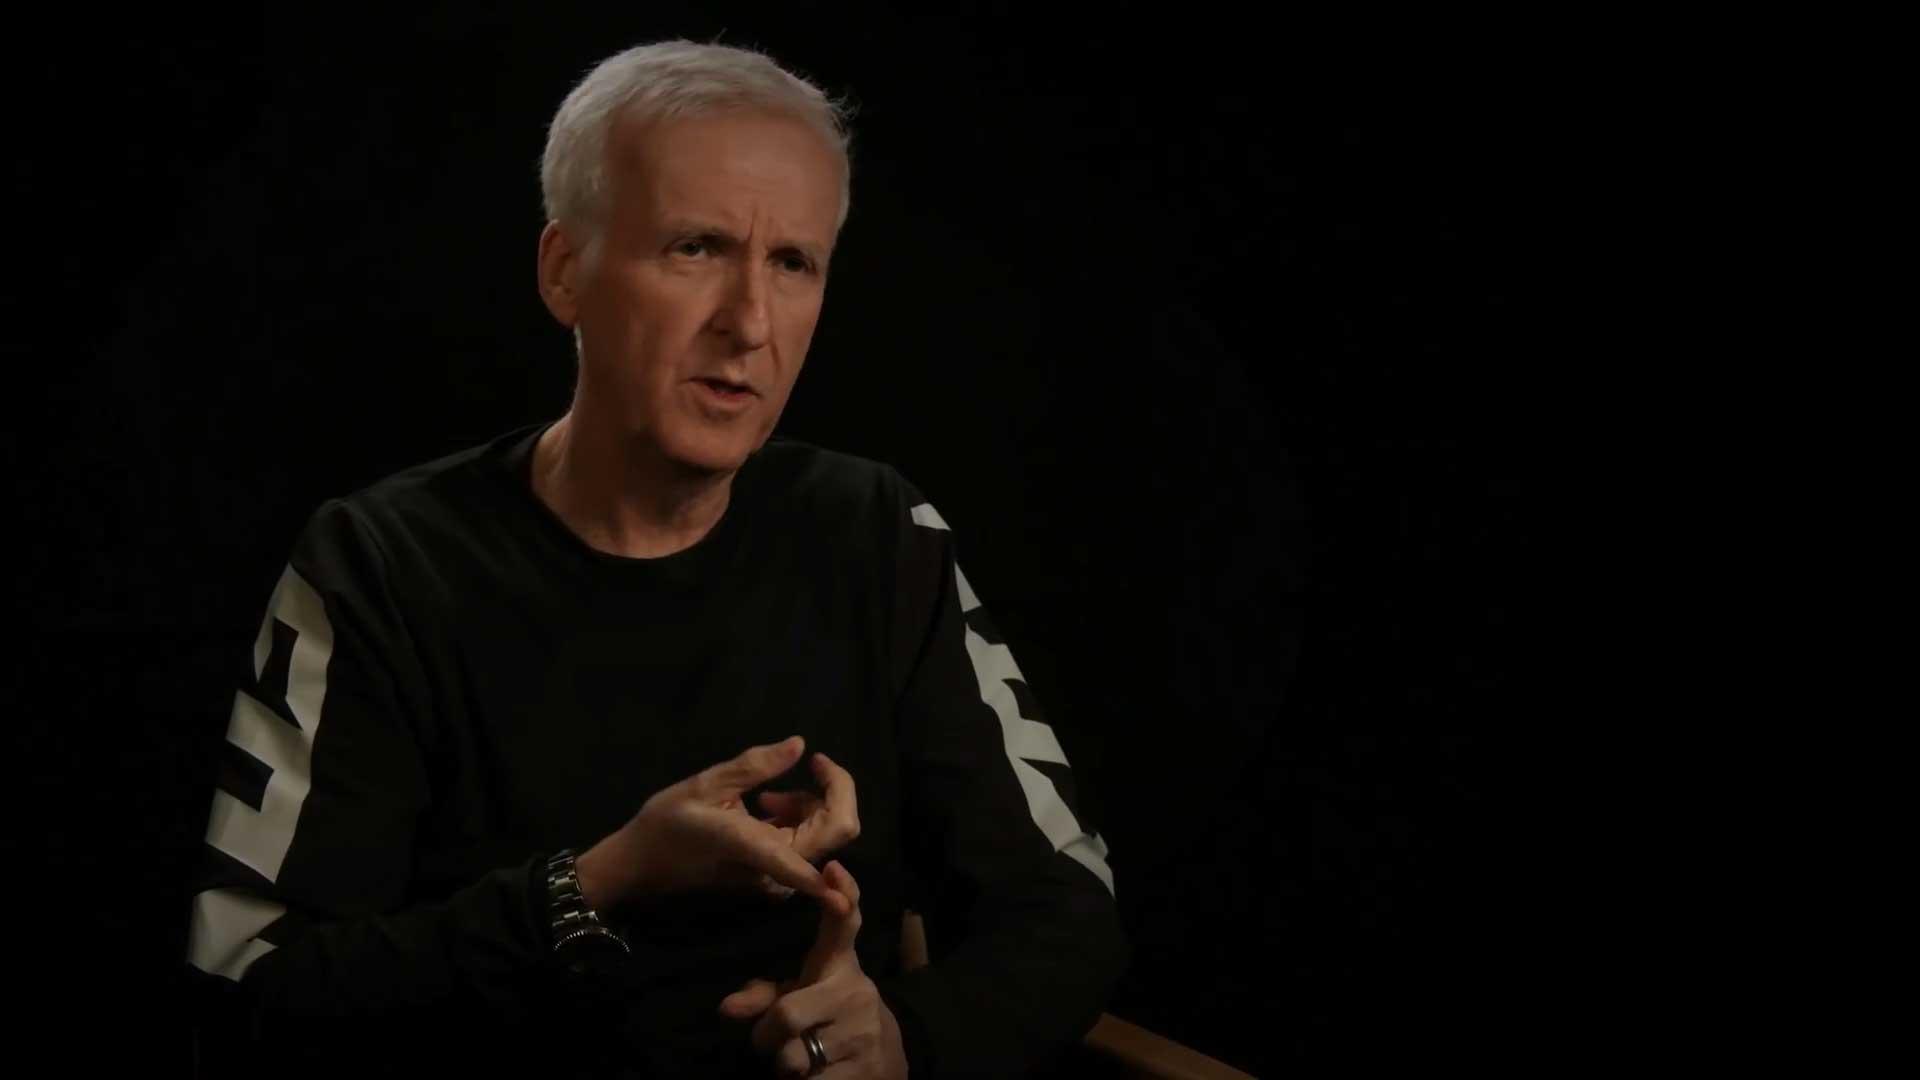 James Cameron Talks Terminator: Dark Fate In Behind The Scenes Featurette